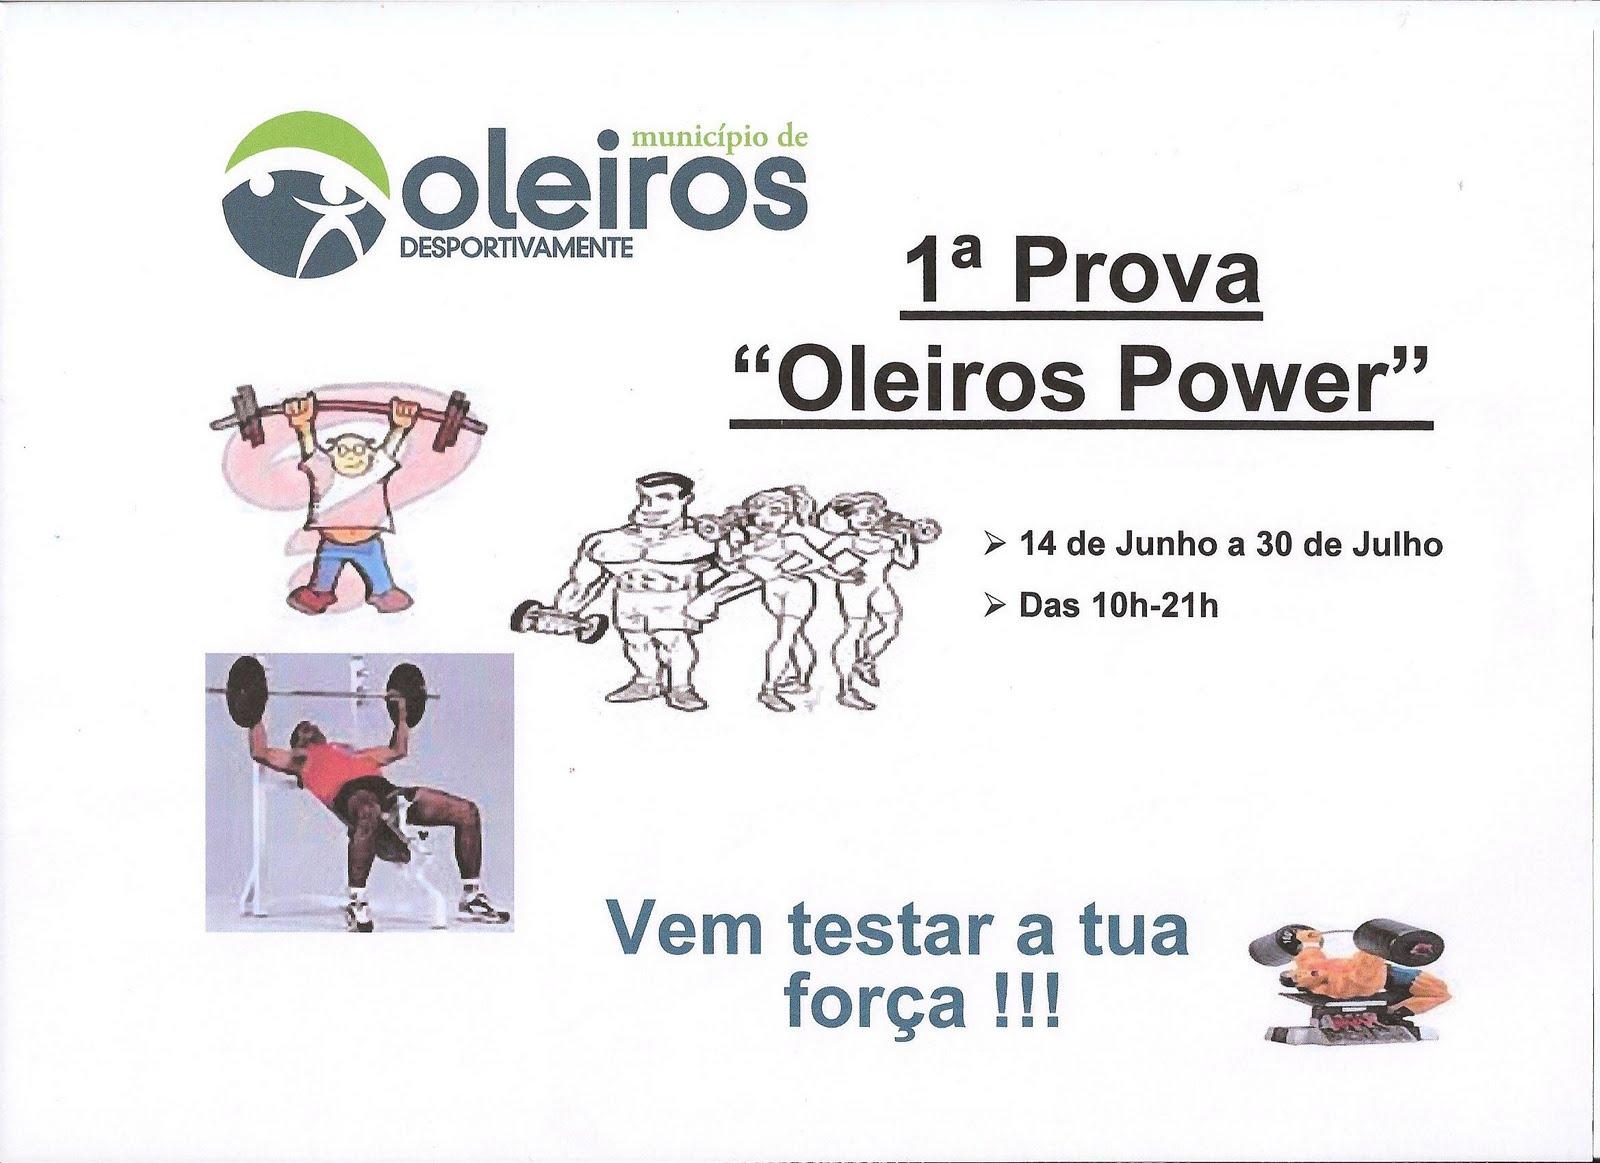 Piscinas municipais de oleiros 1 prova oleiros power for Piscina municipal oleiros